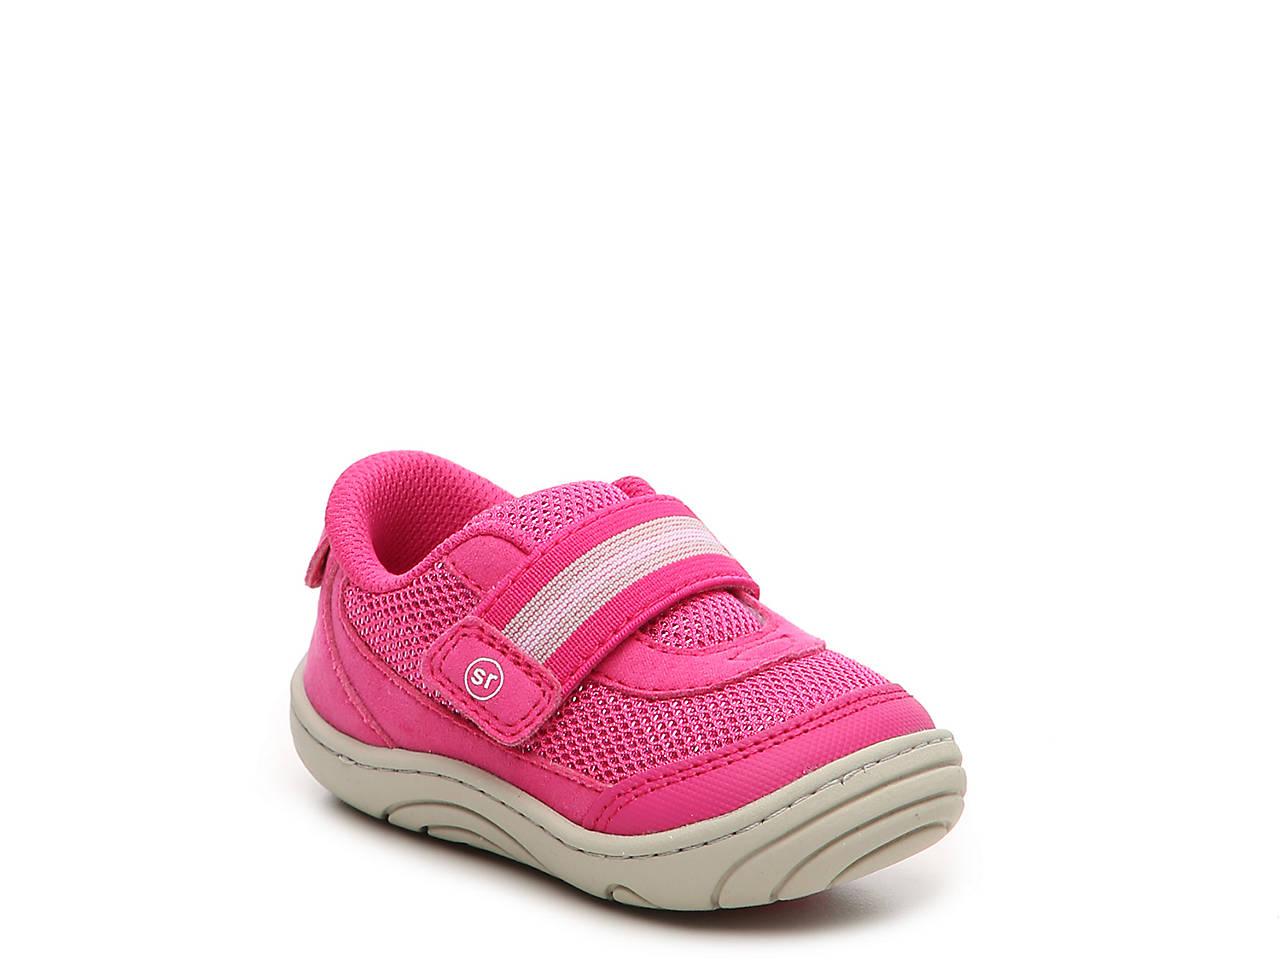 e6787bff21e5 Stride Rite Jessie Infant   Toddler Sneaker Kids Shoes